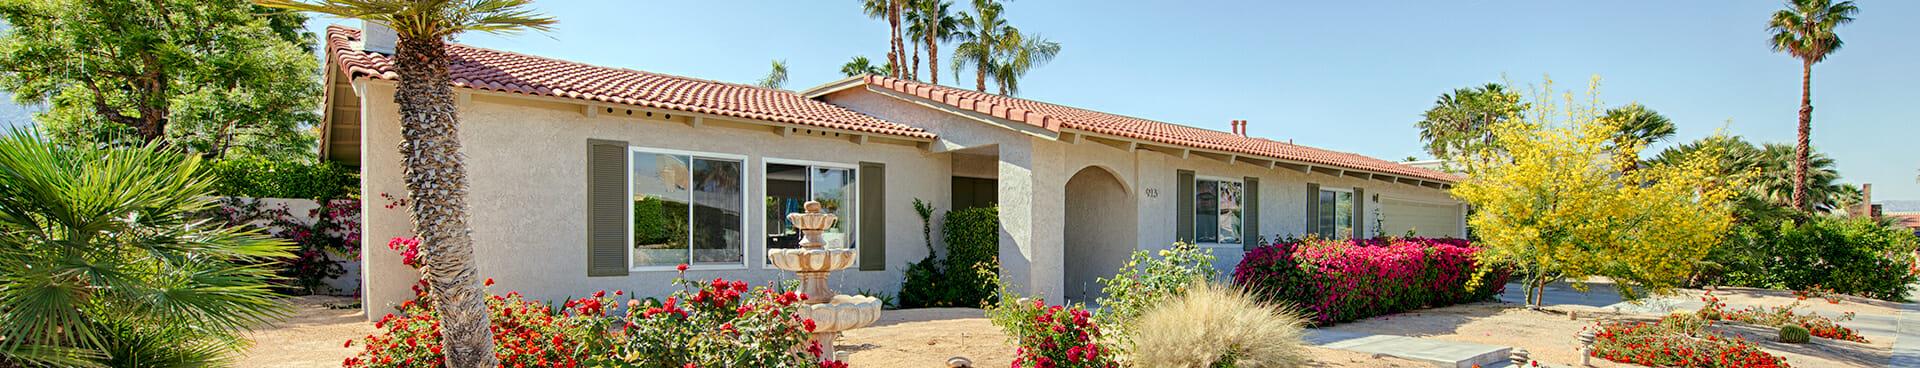 Palm Springs single family homes